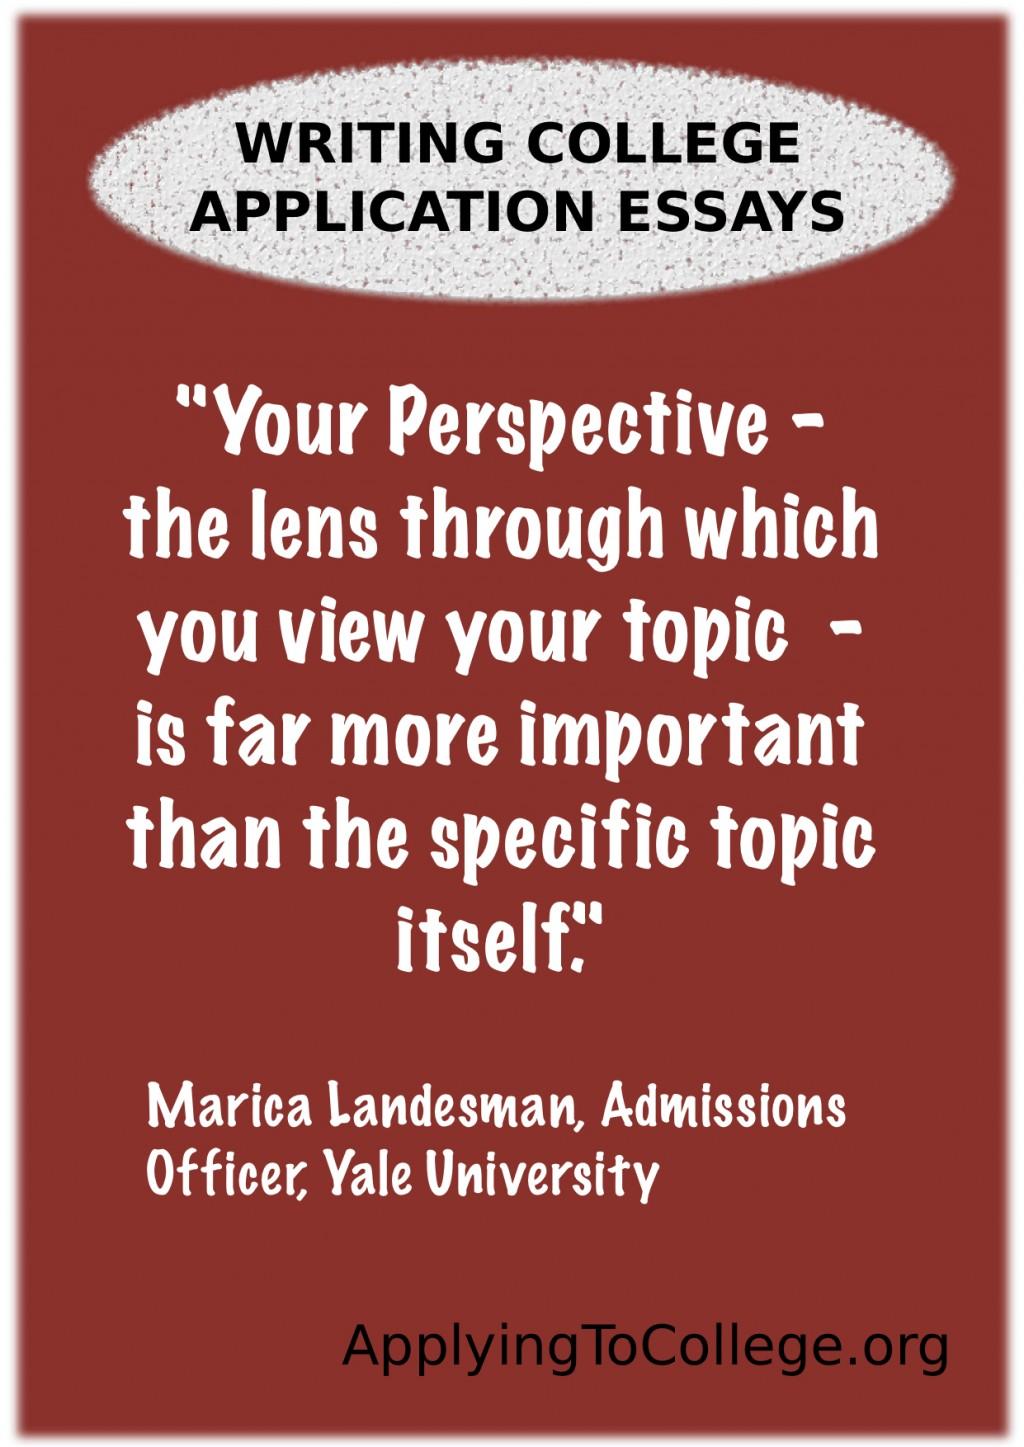 010 Yale Essay Writing Advice Help123 Beautiful Large